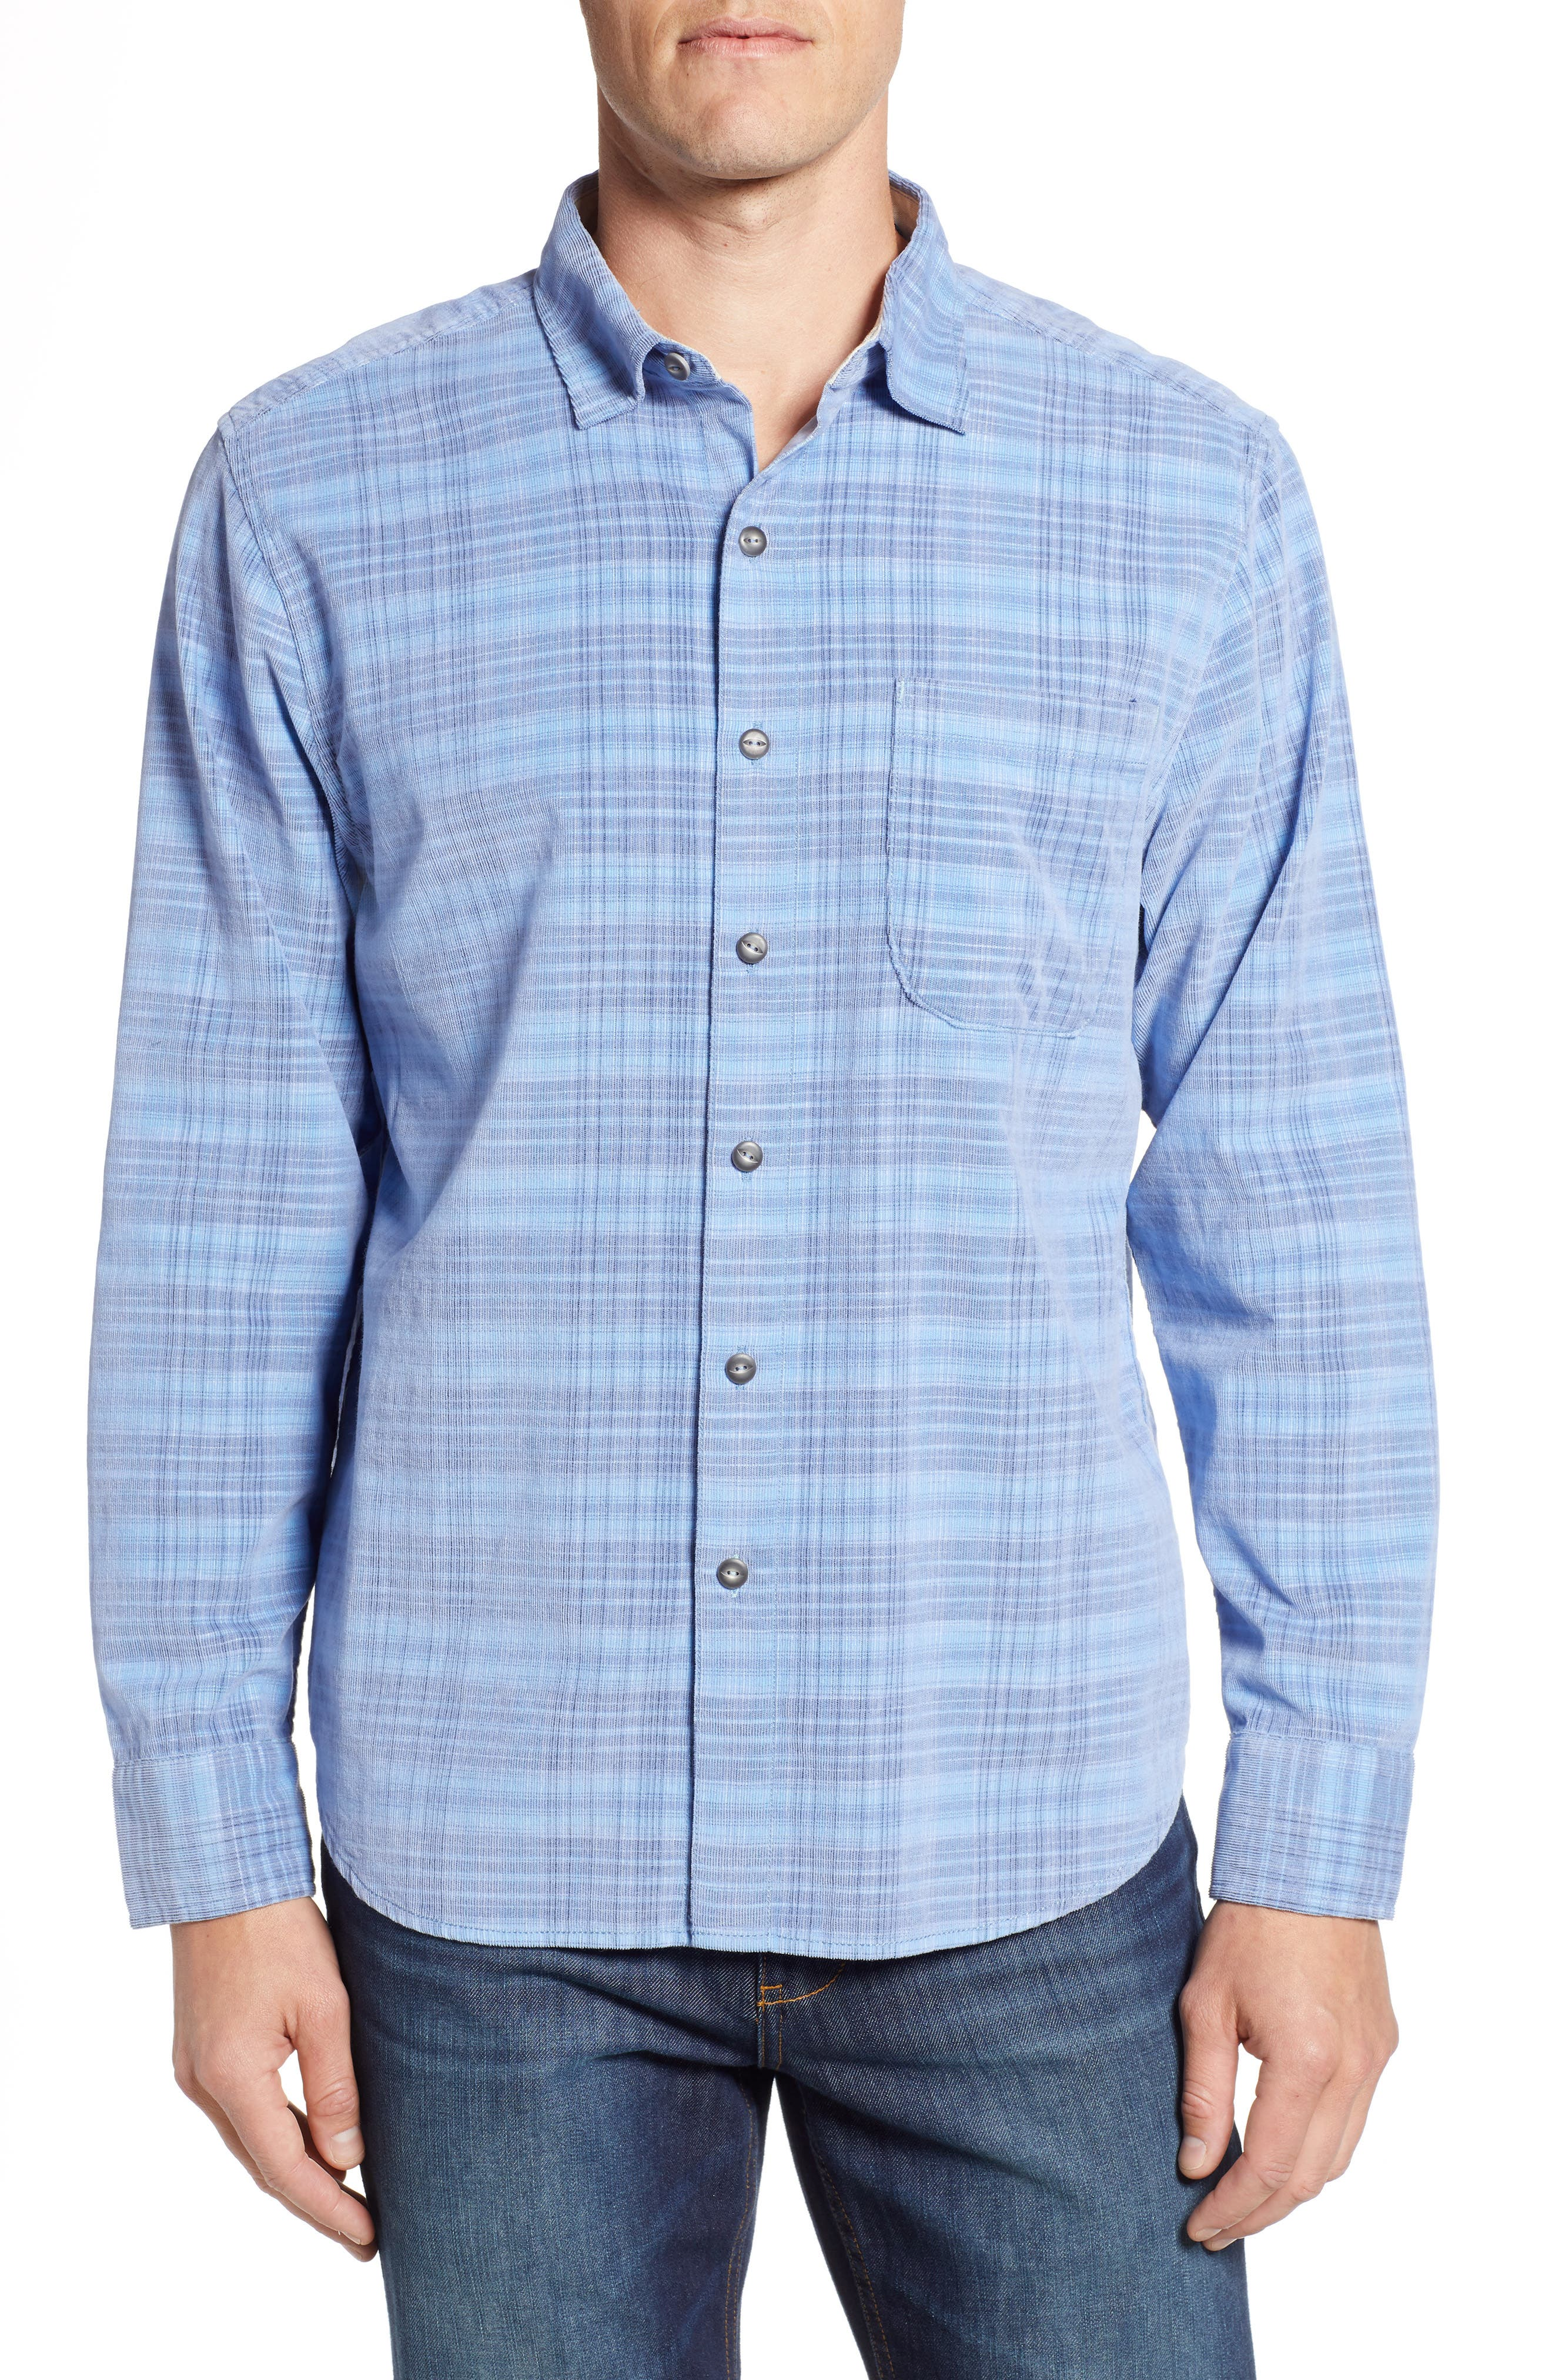 Cruzy Corduroy Shirt,                         Main,                         color, RIVIERA AZURE